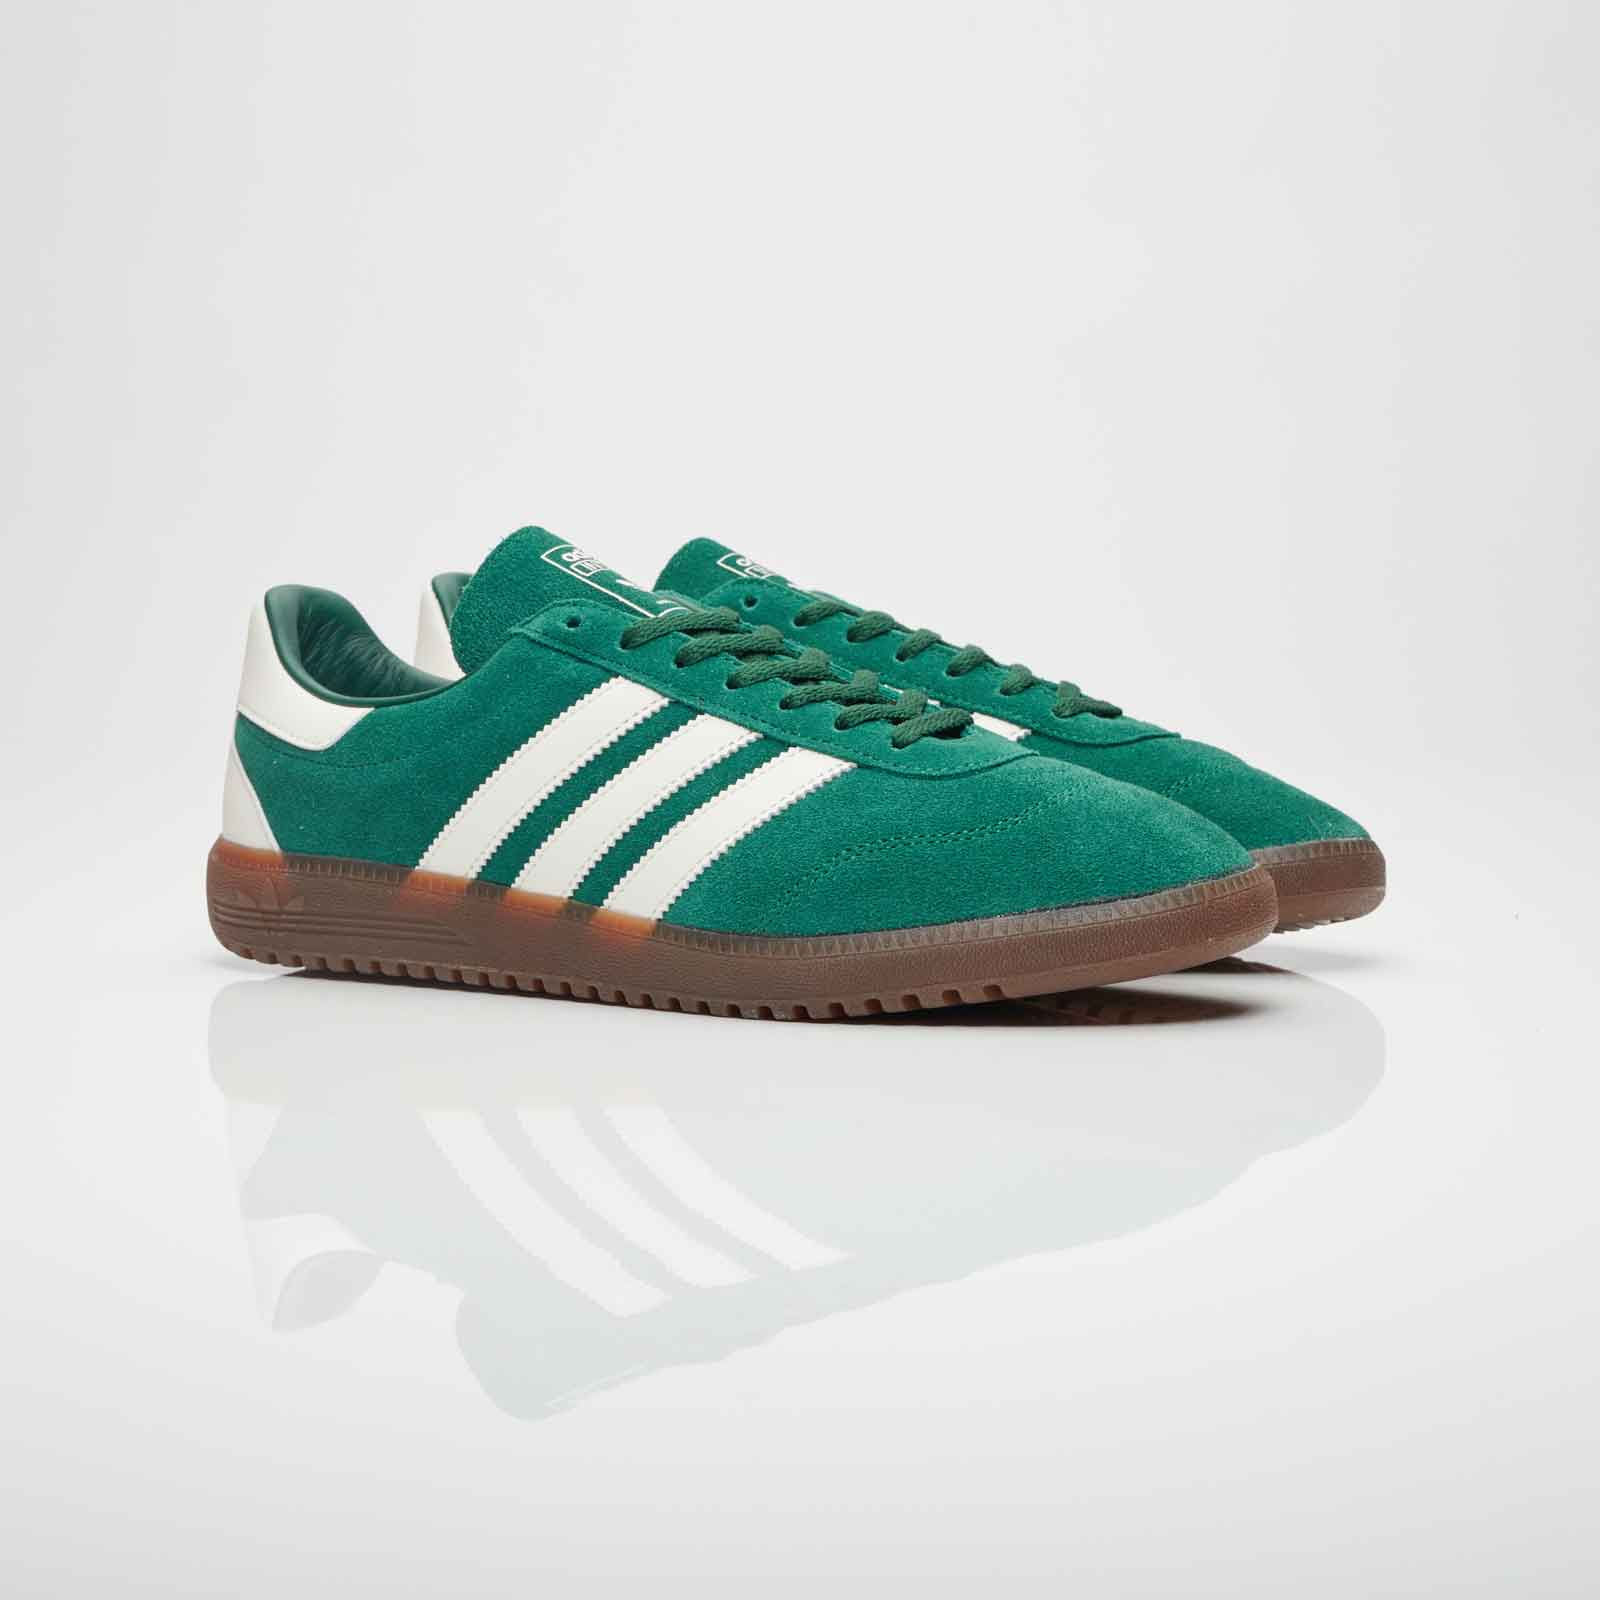 adidas Intack - Cg2919 - Sneakersnstuff